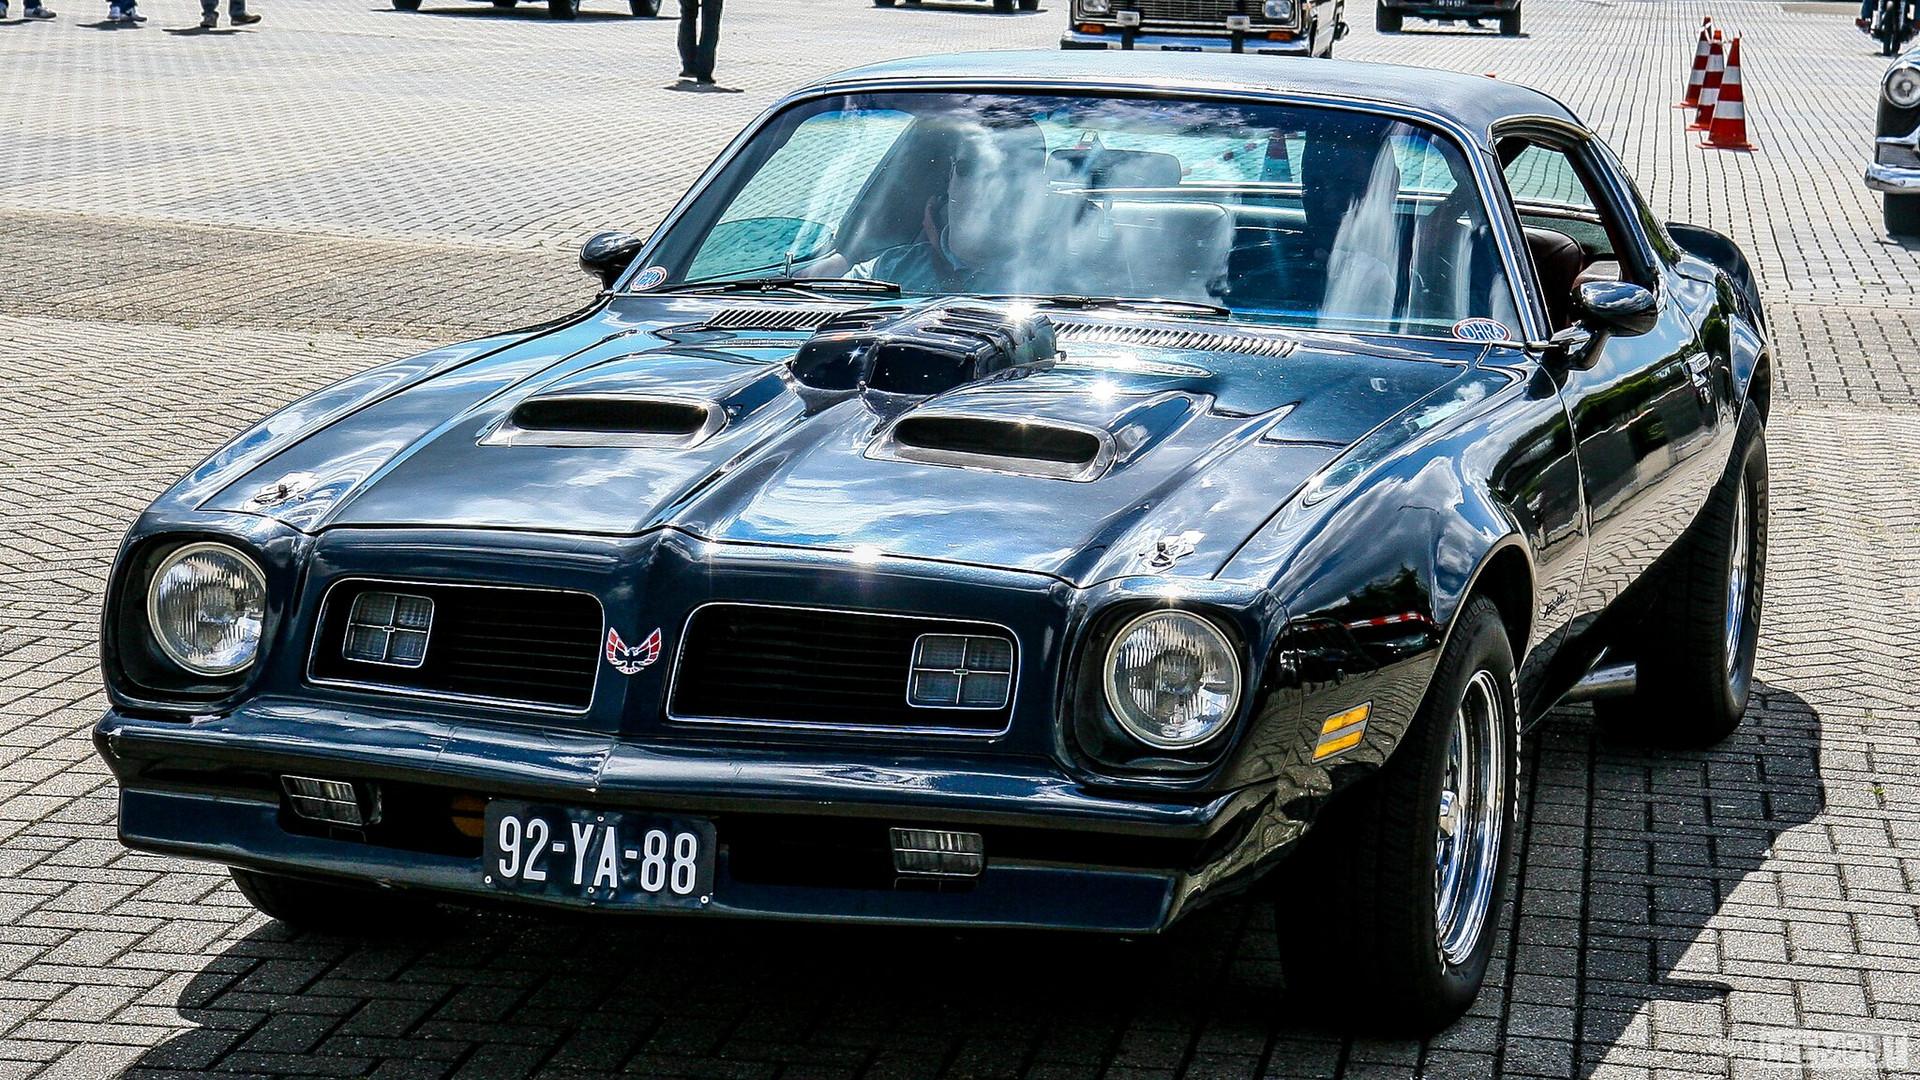 1976 | 92-YA-88 | Pontiac Firebird Formula 400